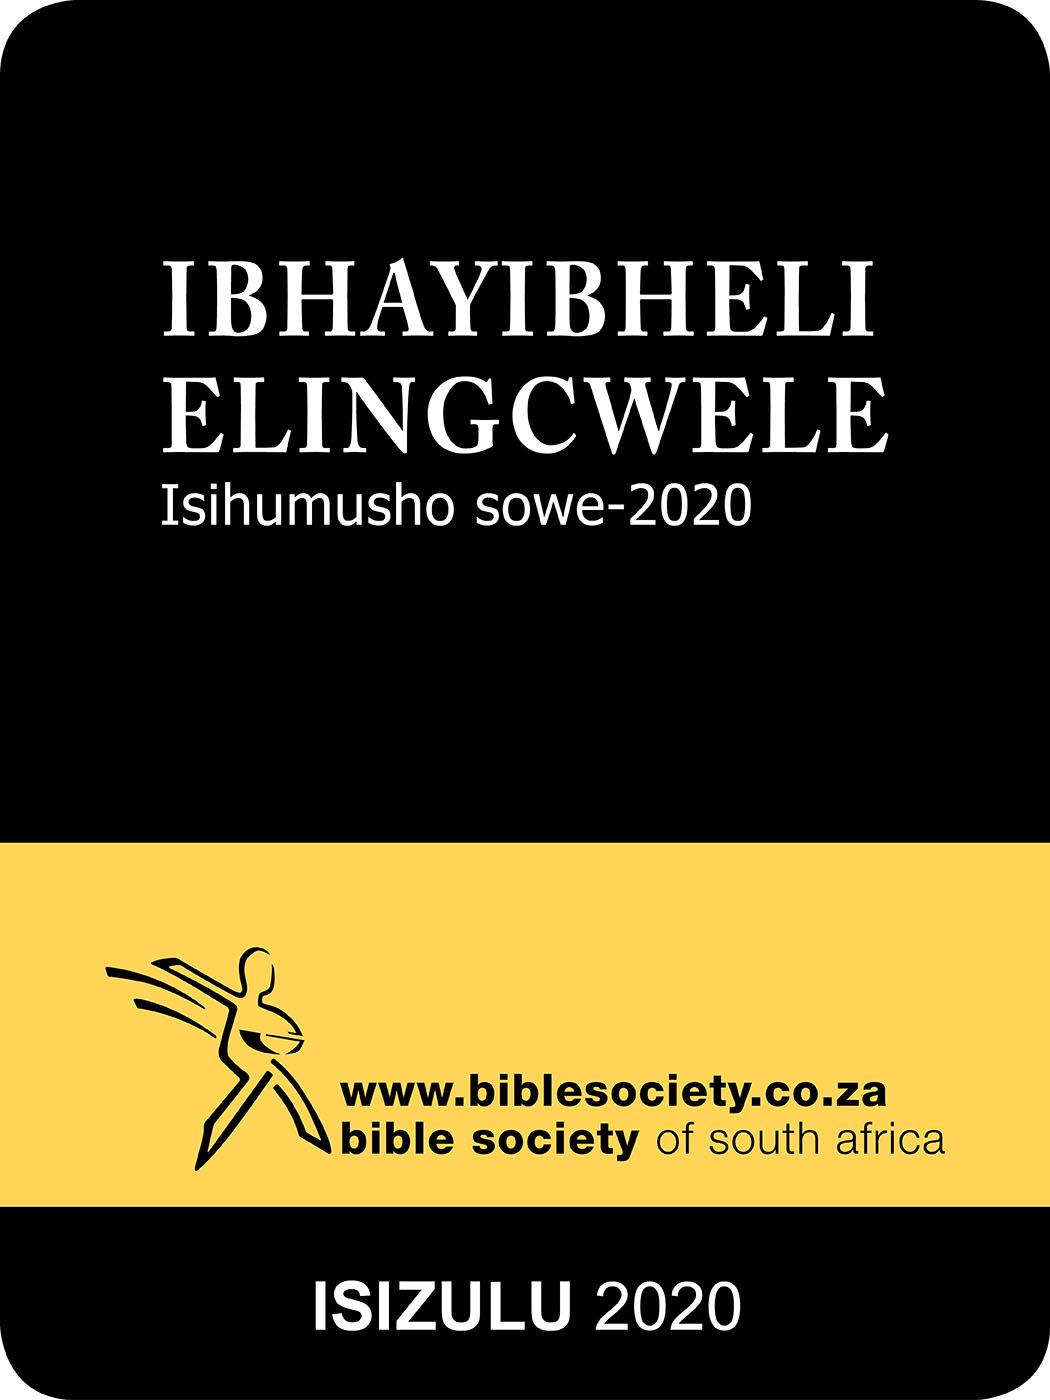 IsiZulu 2020